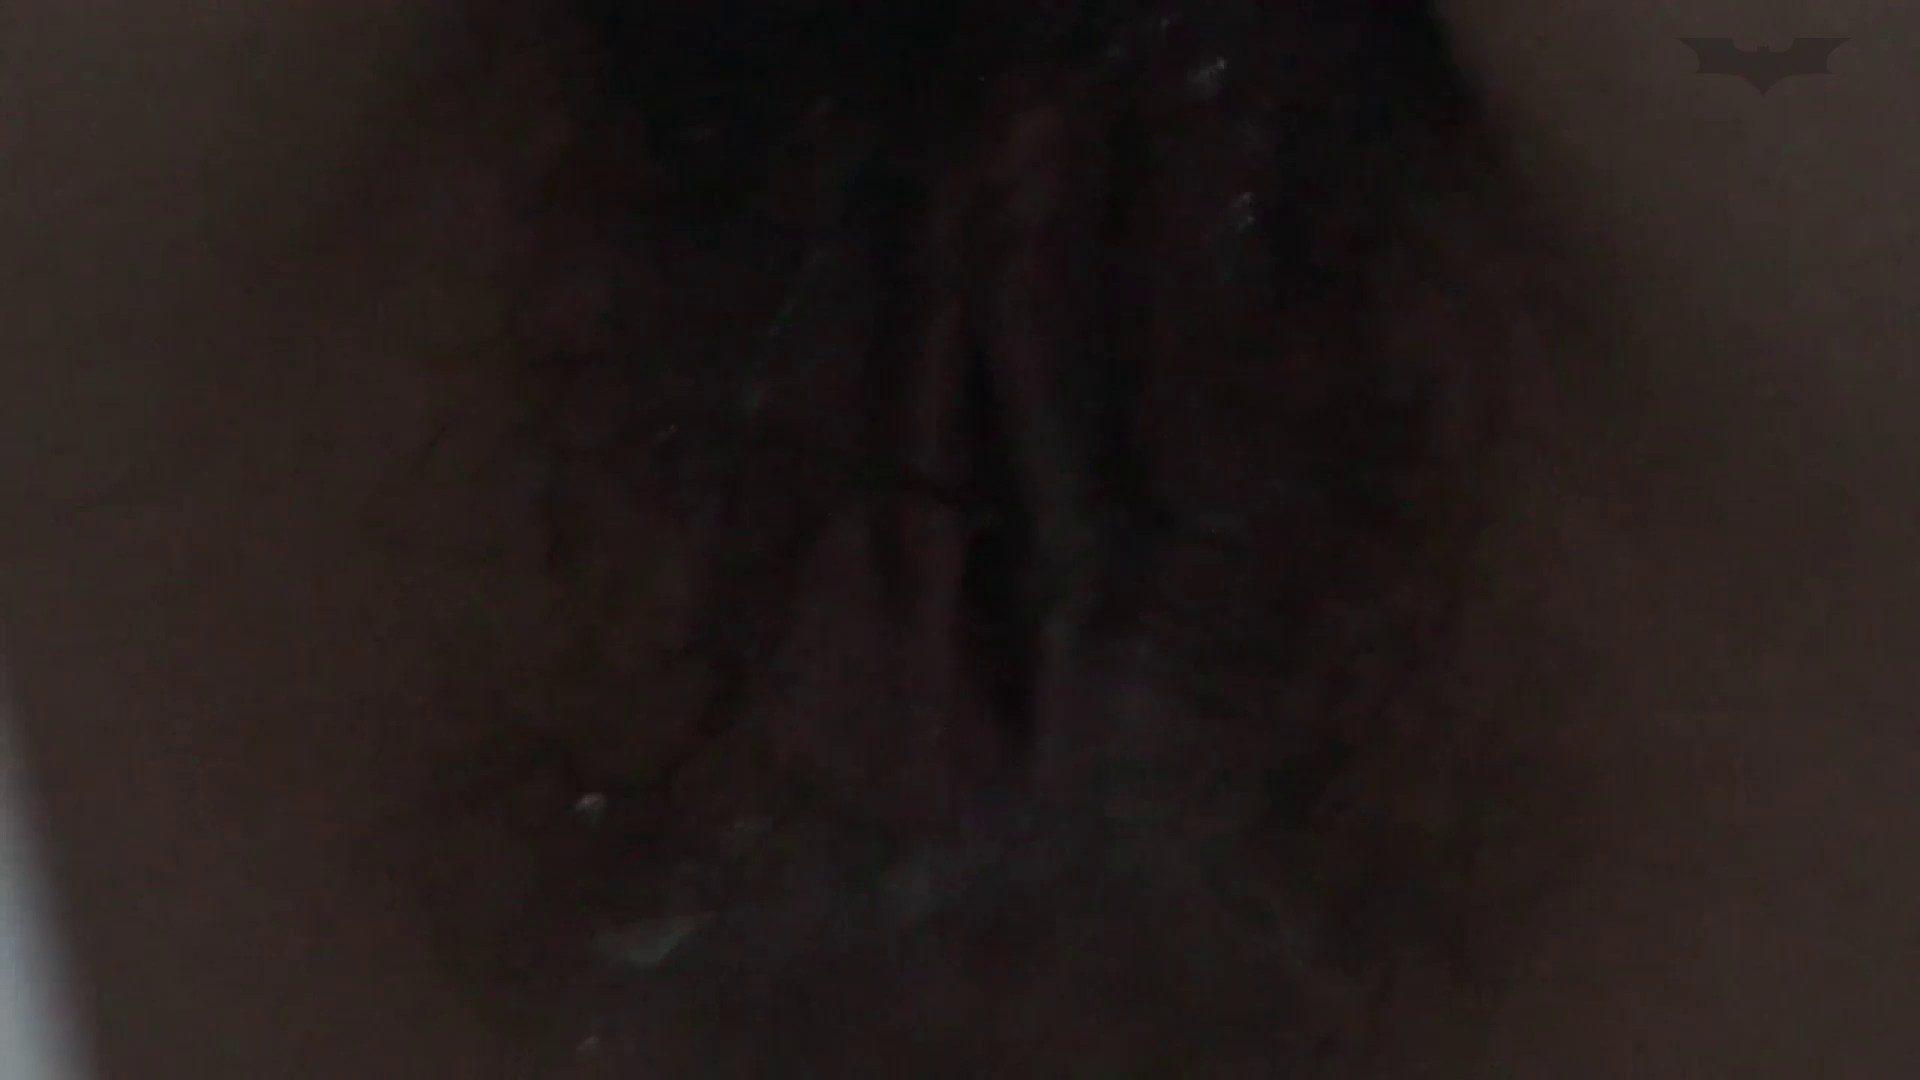 JD盗撮 美女の洗面所の秘密 Vol.58 ギャル攻め 濡れ場動画紹介 56画像 47